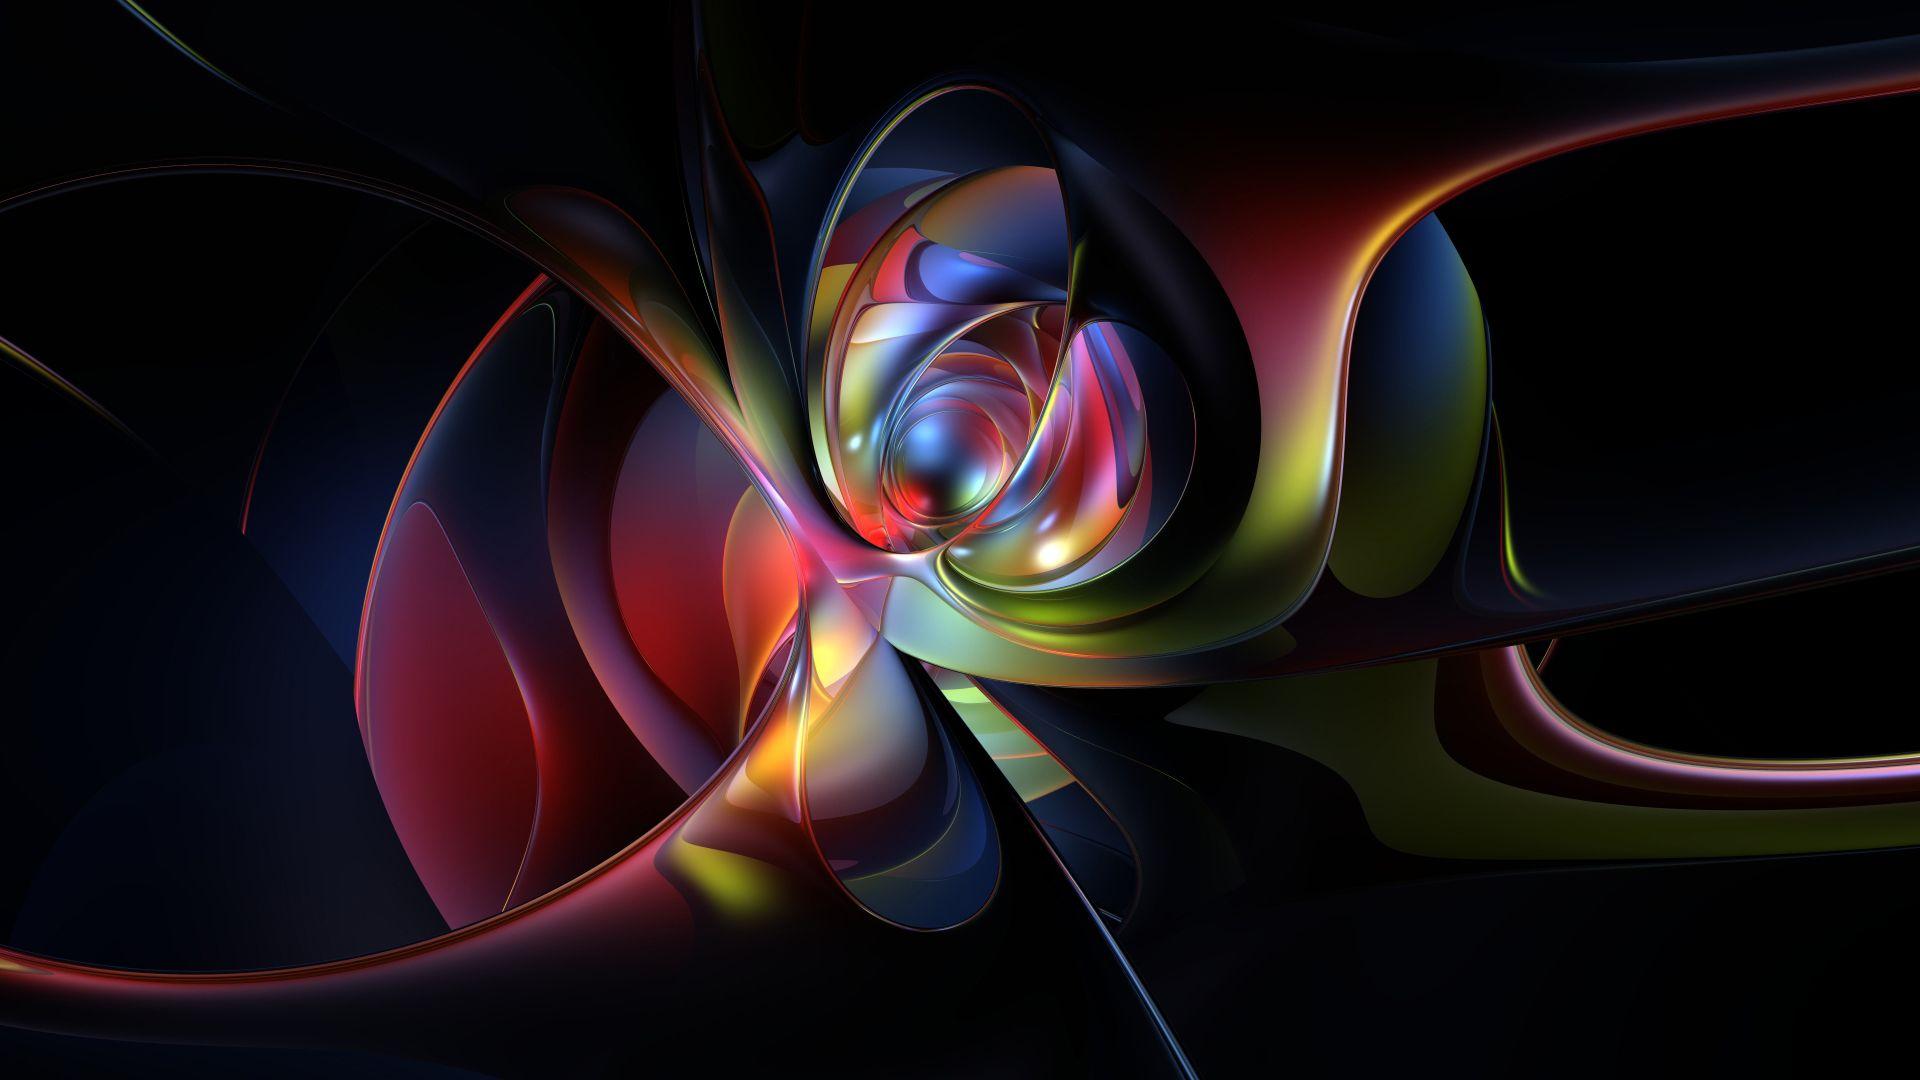 1080p HD Wallpaper HD Wallpapers Pulse